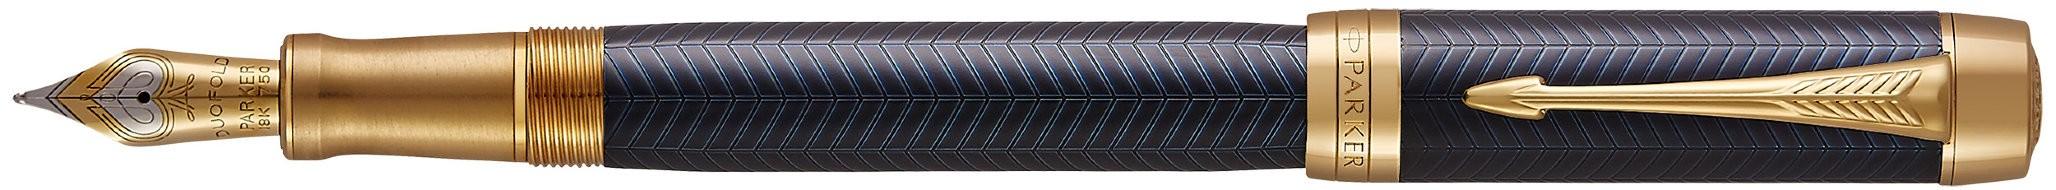 Перьевая ручка Parker Duofold F307 Prestige Centennial Blue Chevron GT в Воронеже